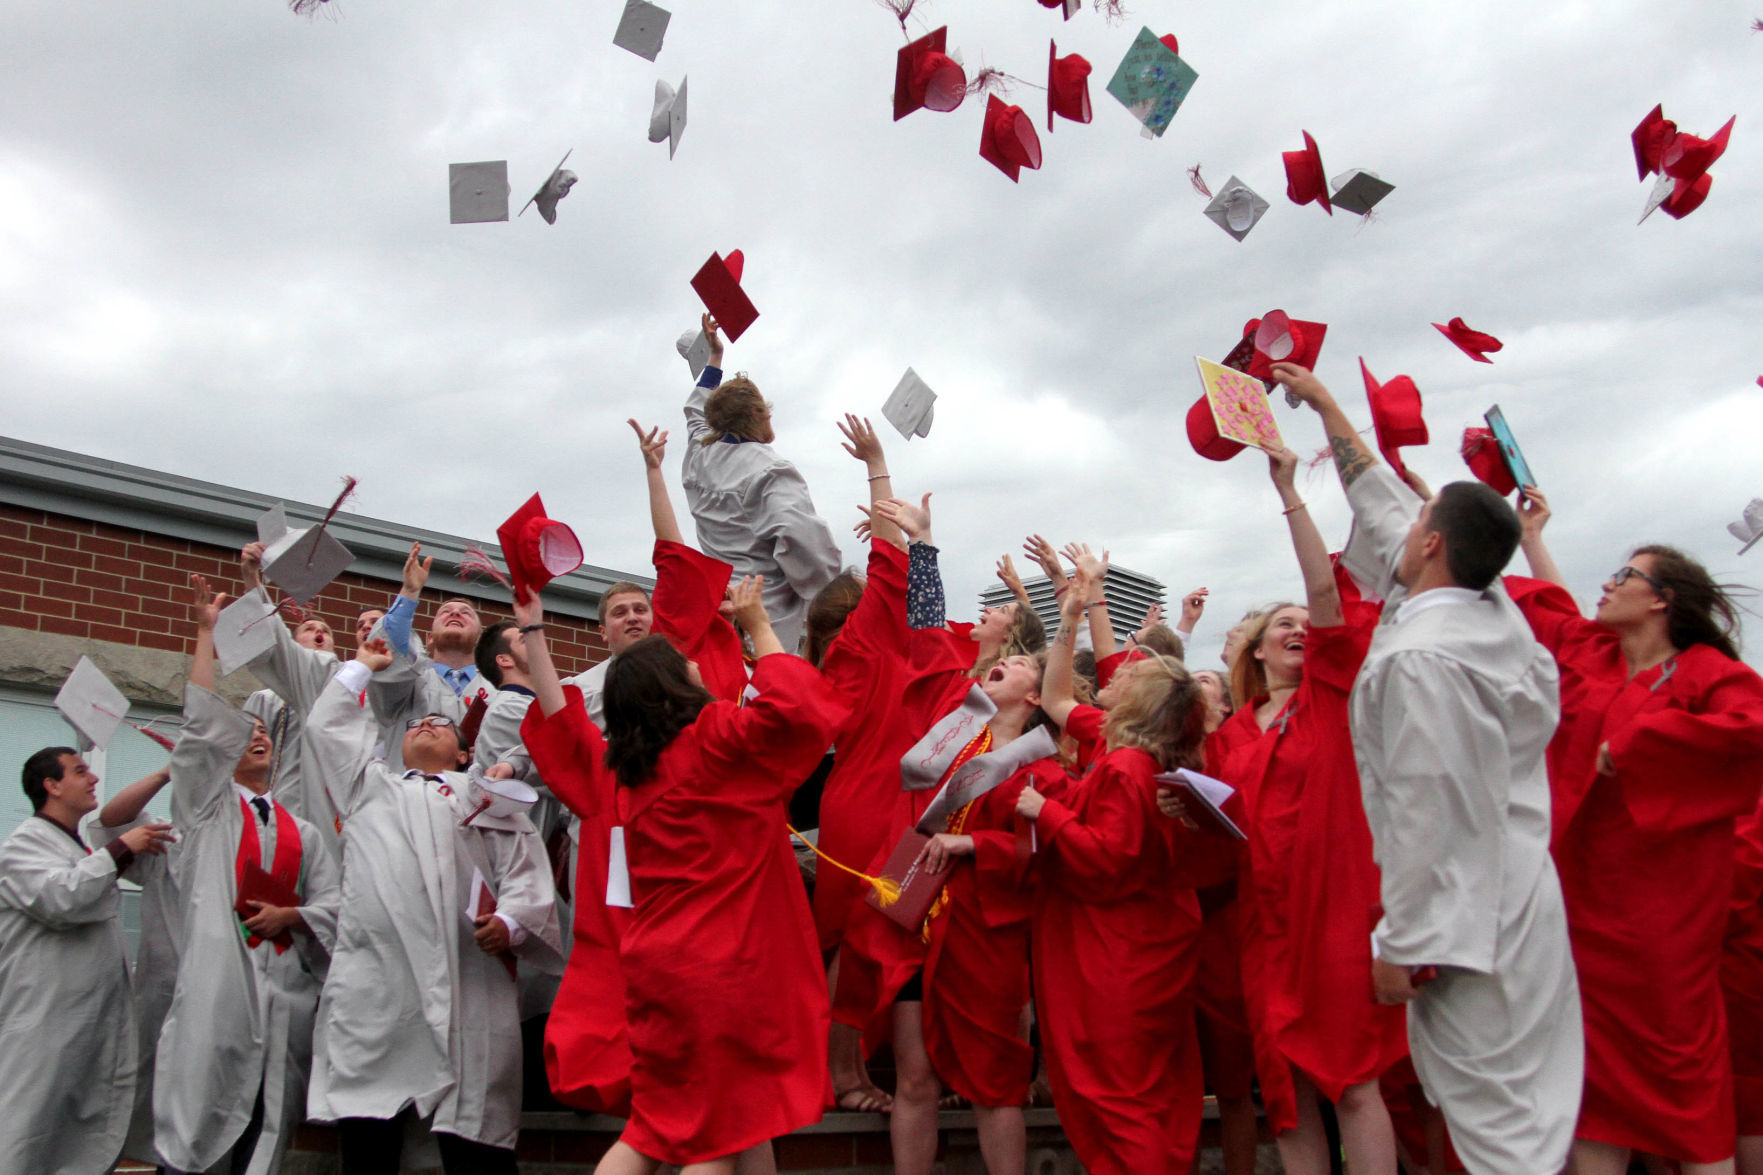 GALLERY: Buckeye Central graduation 2019